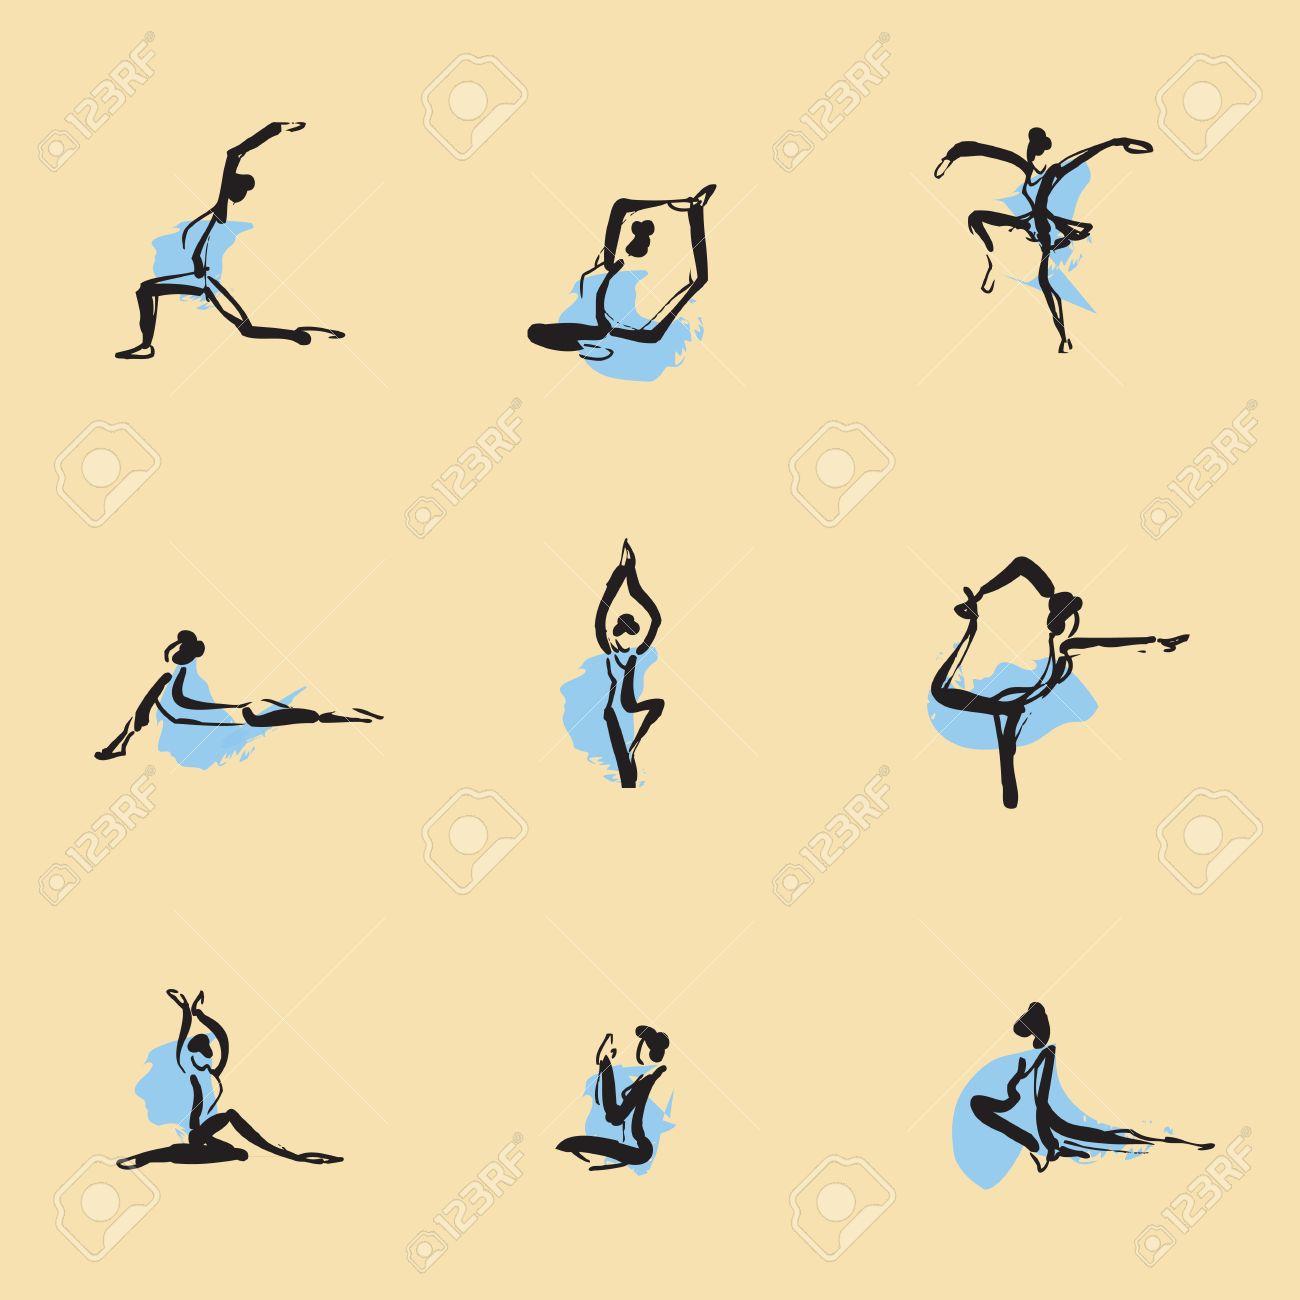 Yoga Chinese brush icon drawing set Stock Vector - 23306130